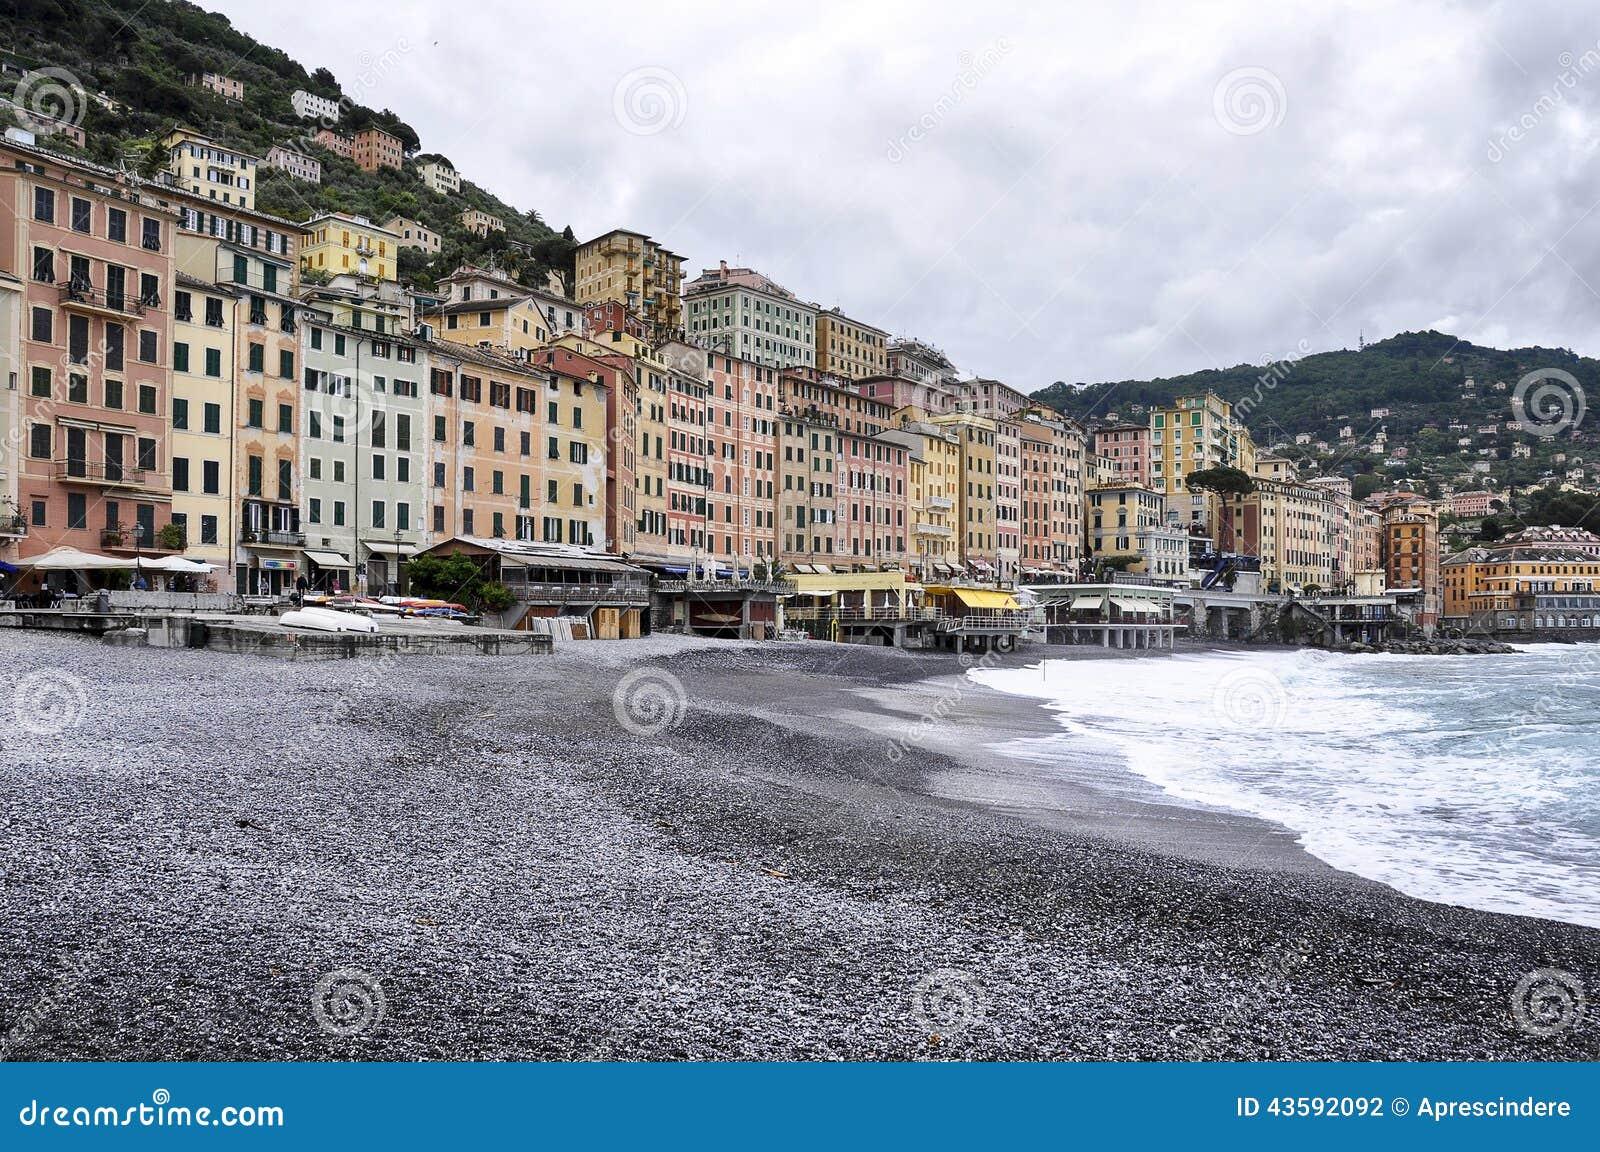 Camogli Italy  city photos gallery : View of Camogli: a small Italian fishing village and tourist resort.